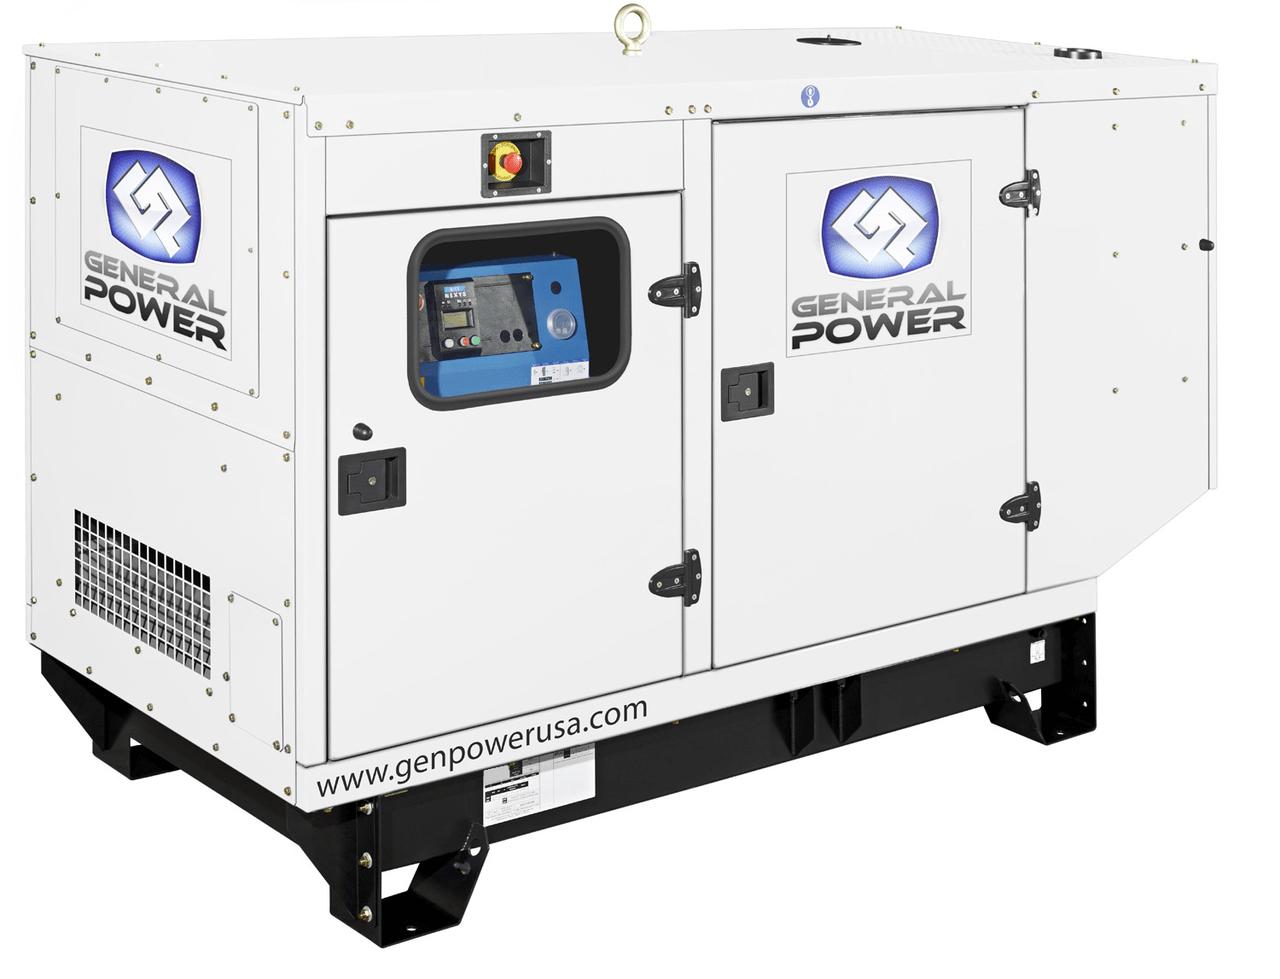 medium resolution of 100 kw diesel generator john deere diesel generator cat 22 kw generator cat 350 kw generator wiring diagram